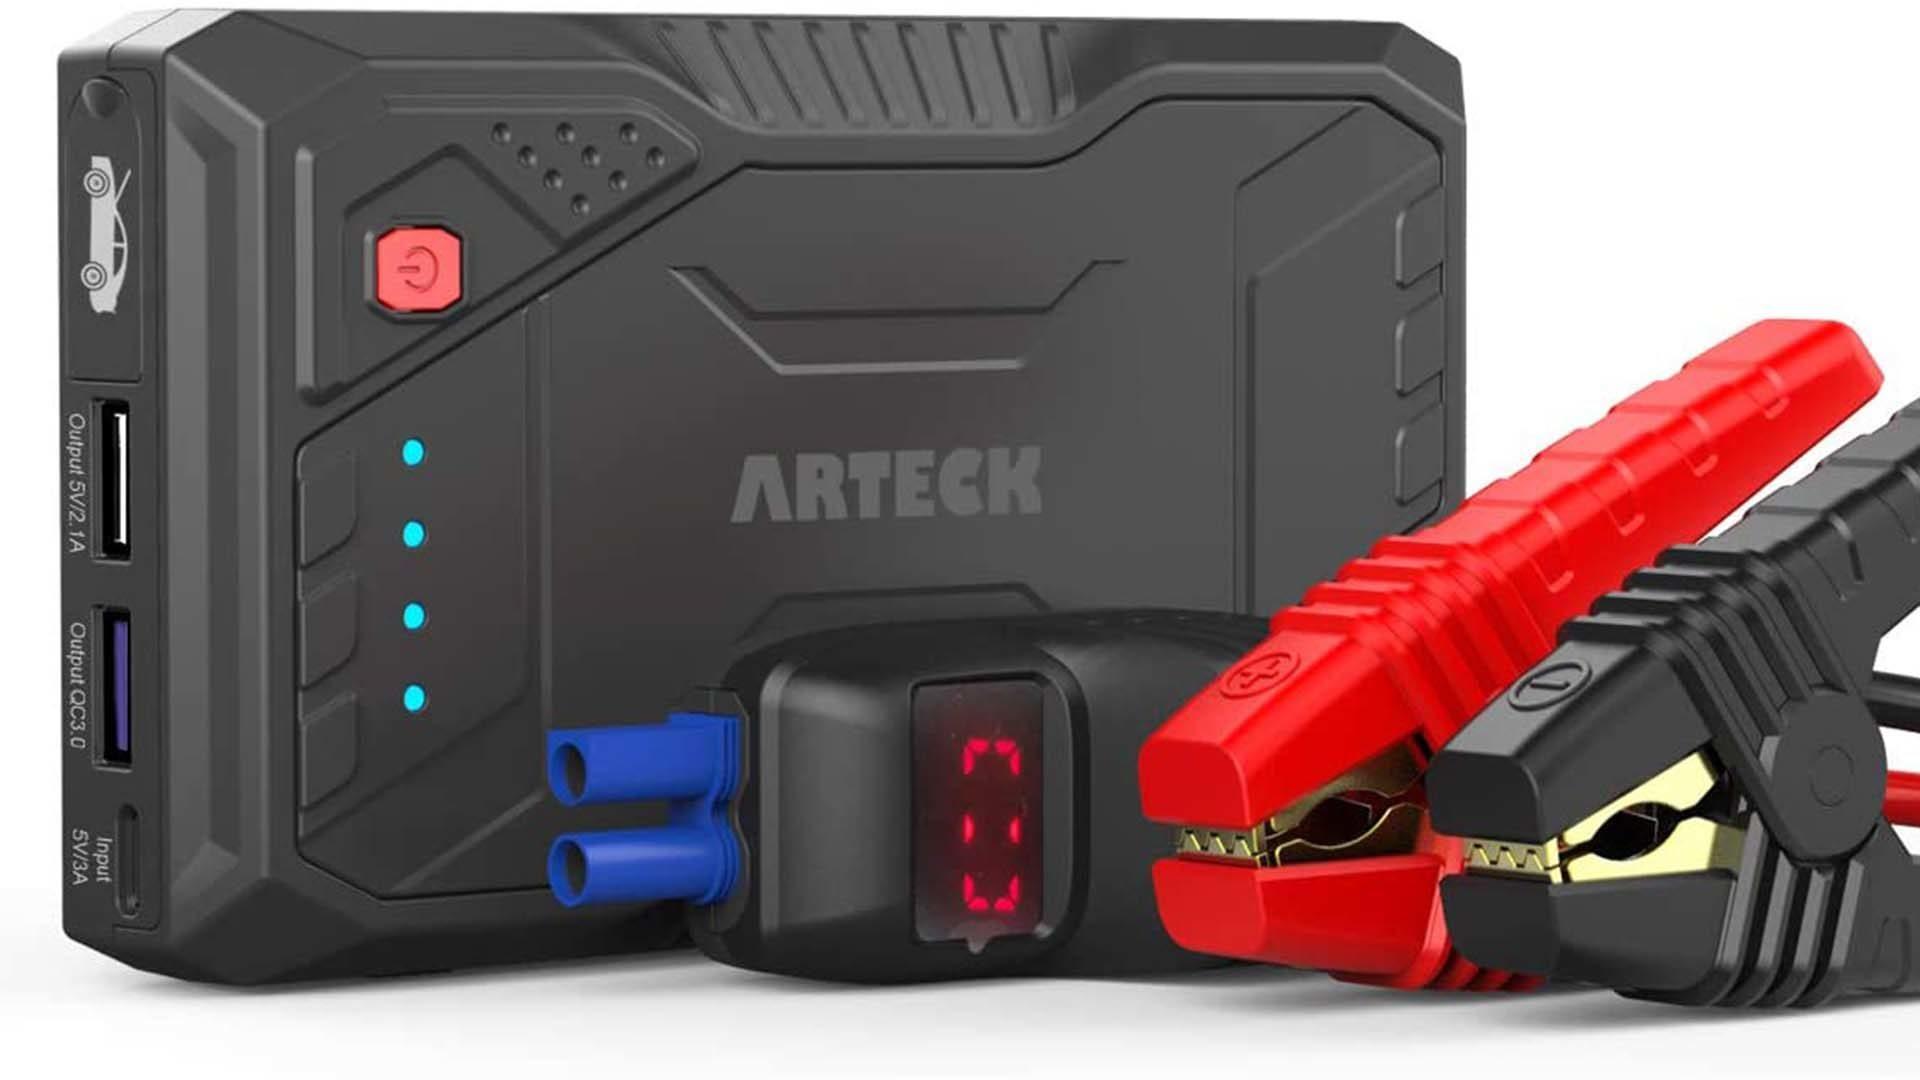 Arteck portable car jump starter